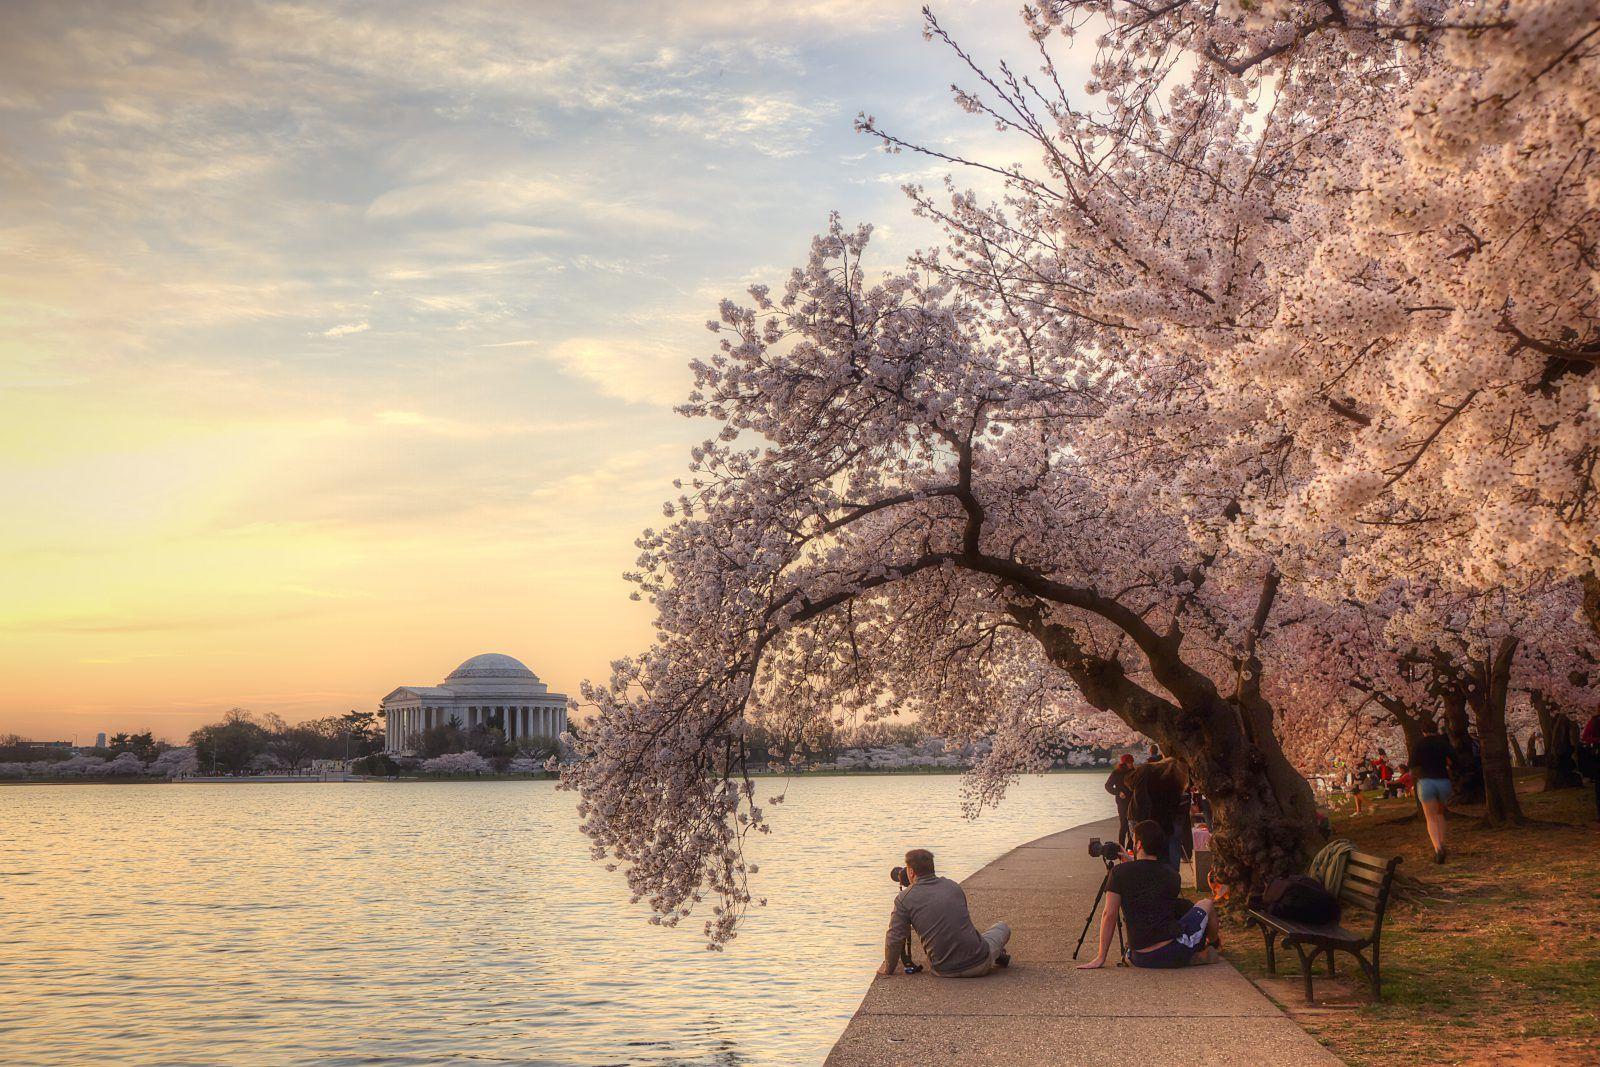 Cherry Blossoms Tidal Basin Photographers Sunrise Jefferson Memorial Washington Dc Trees Washington Dc Travel Washington Dc Monuments Washington Dc